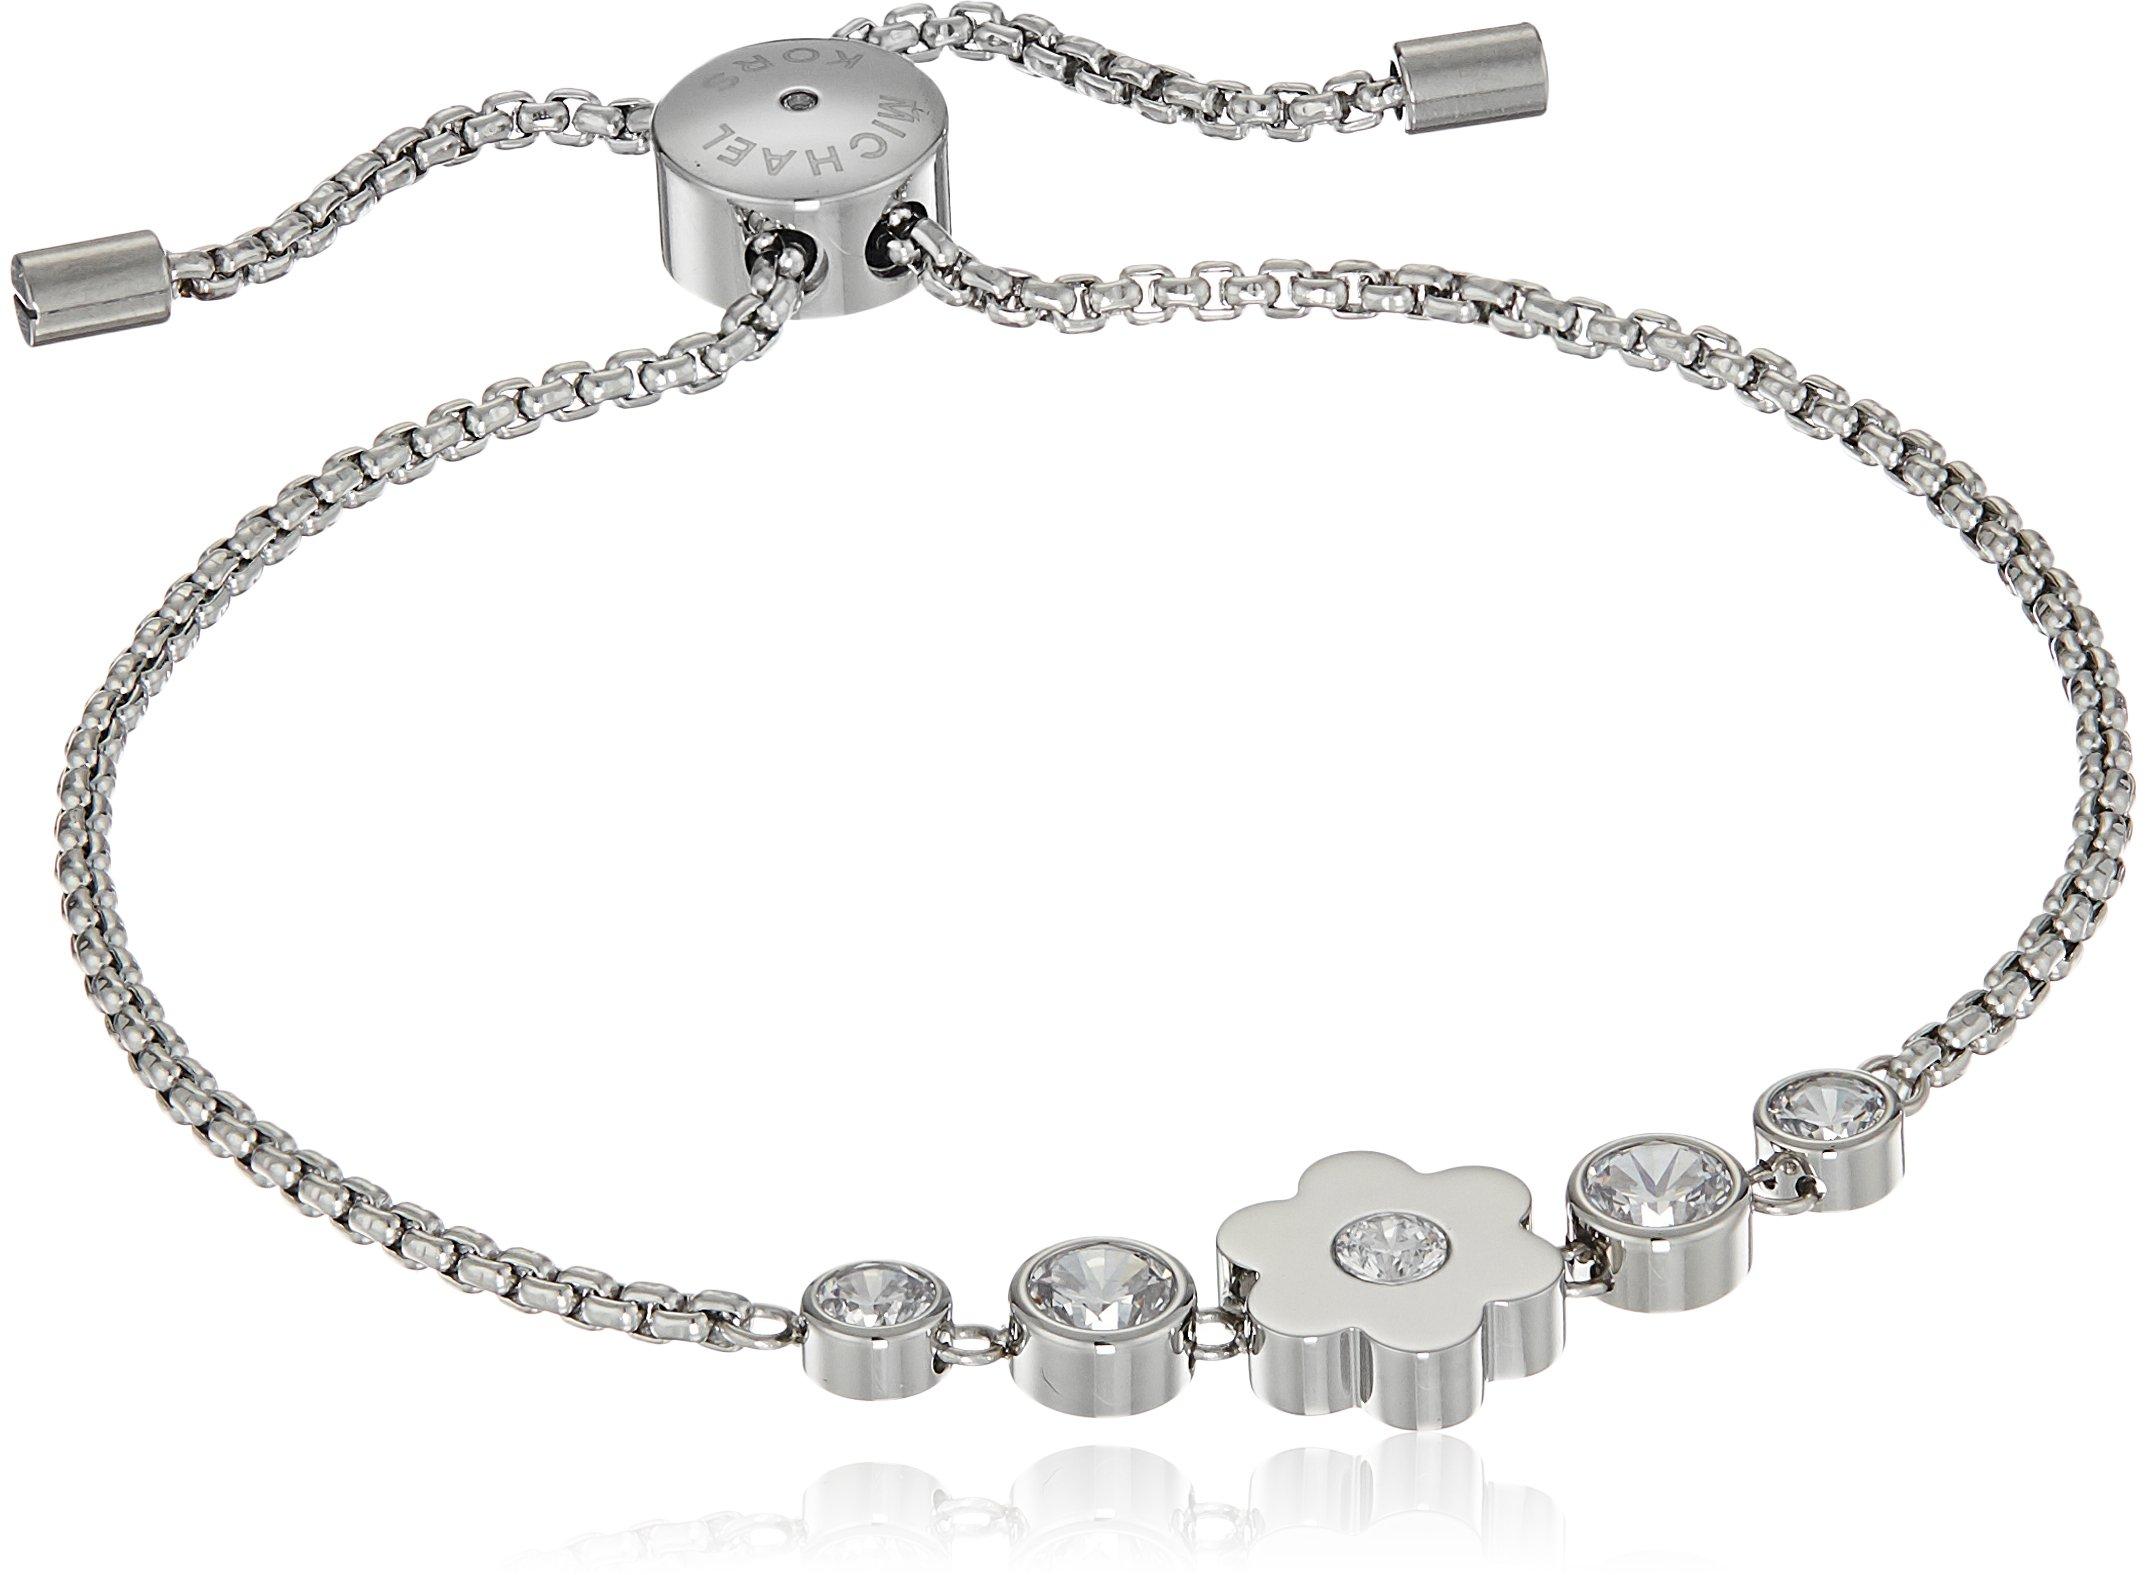 Michael Kors Womens Silver-Tone Flower Link Charm Bracelet, One Size